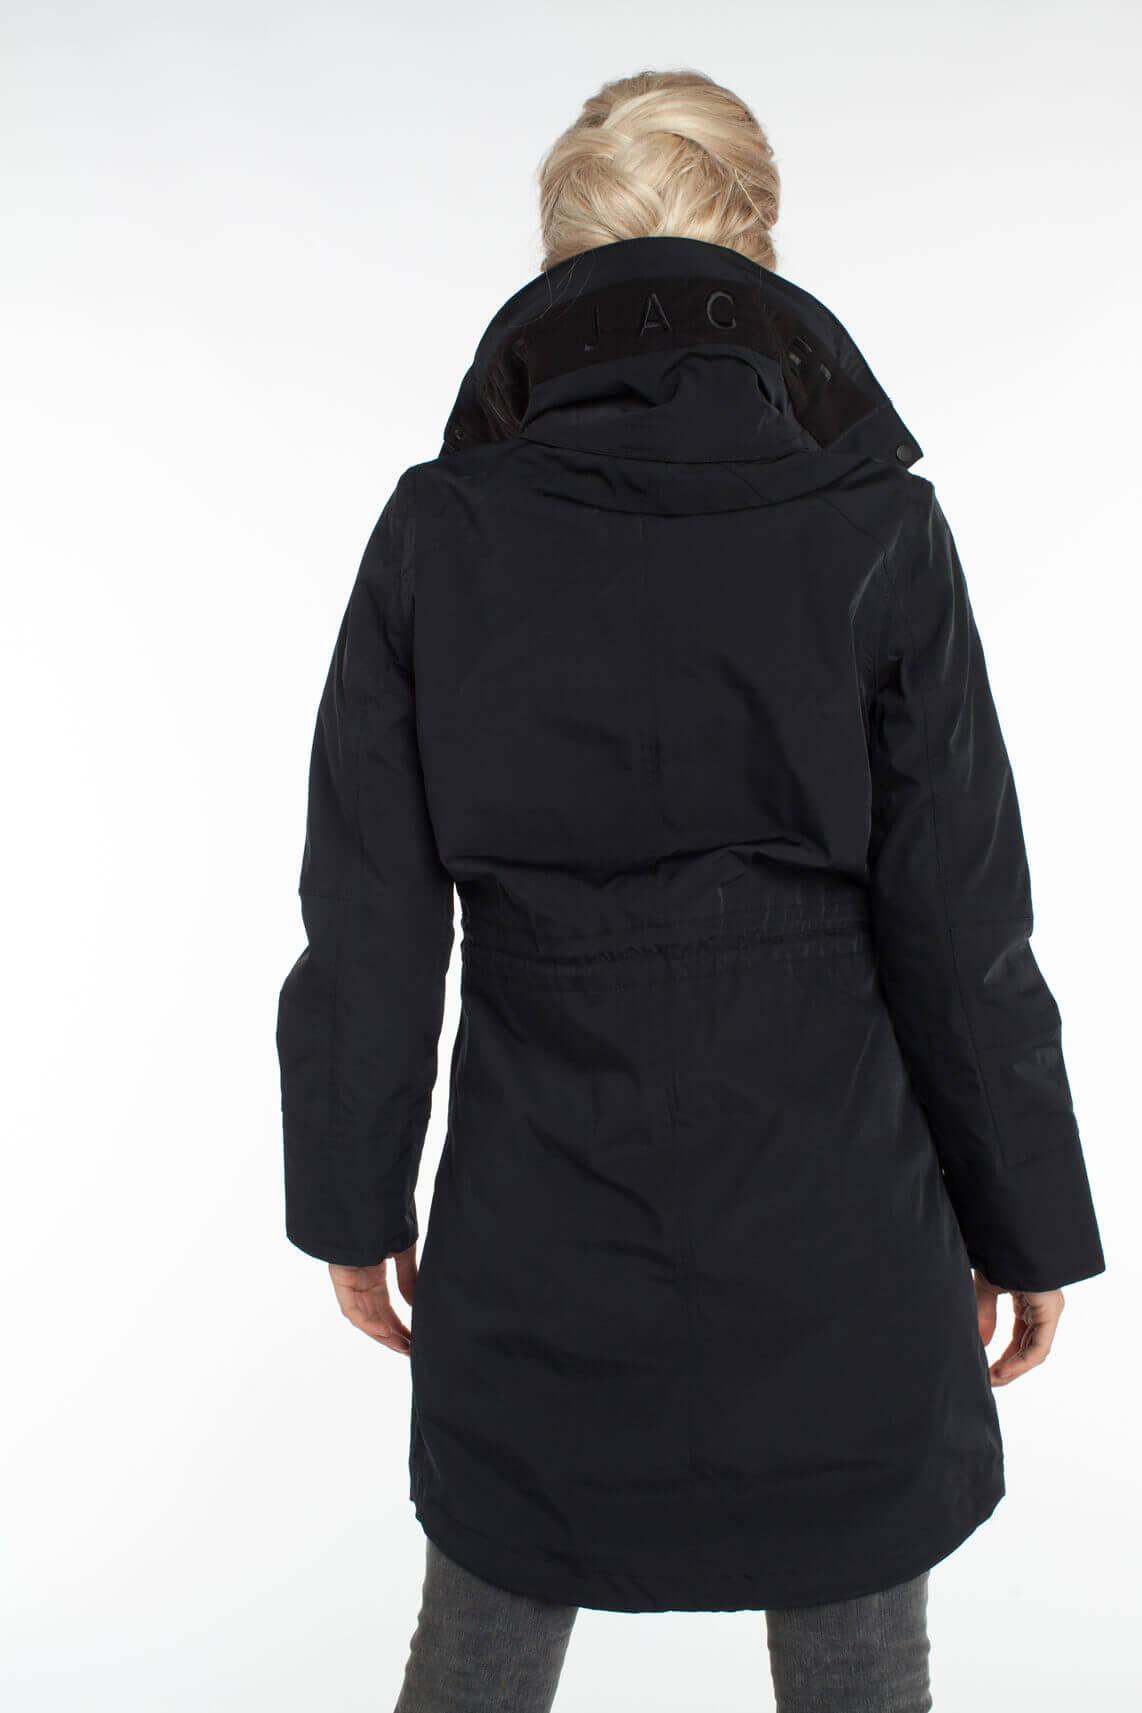 Giacomo Dames Waterproof jas zwart